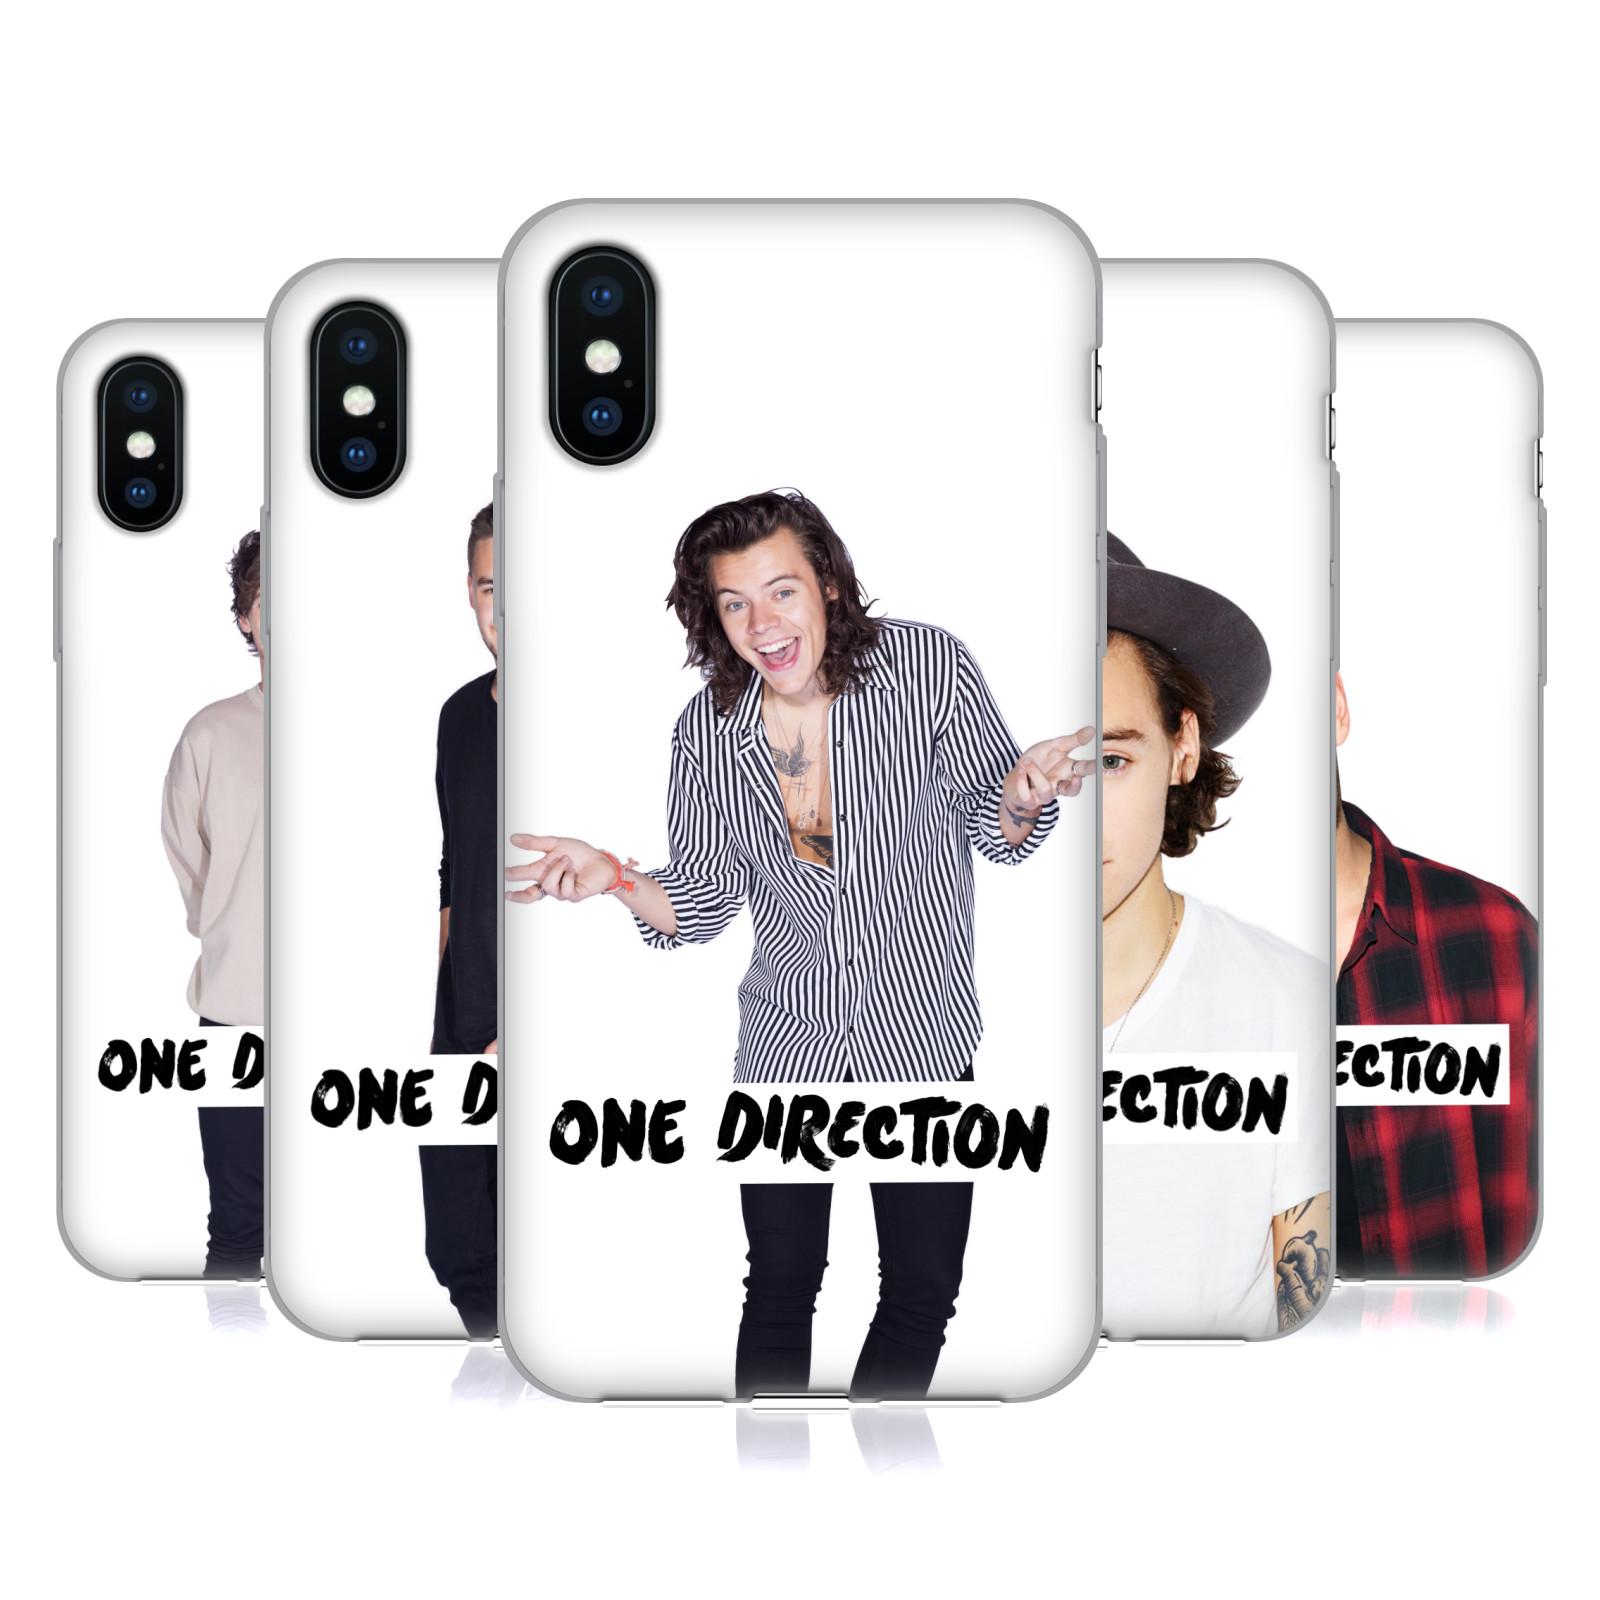 One Direction Studio Shots